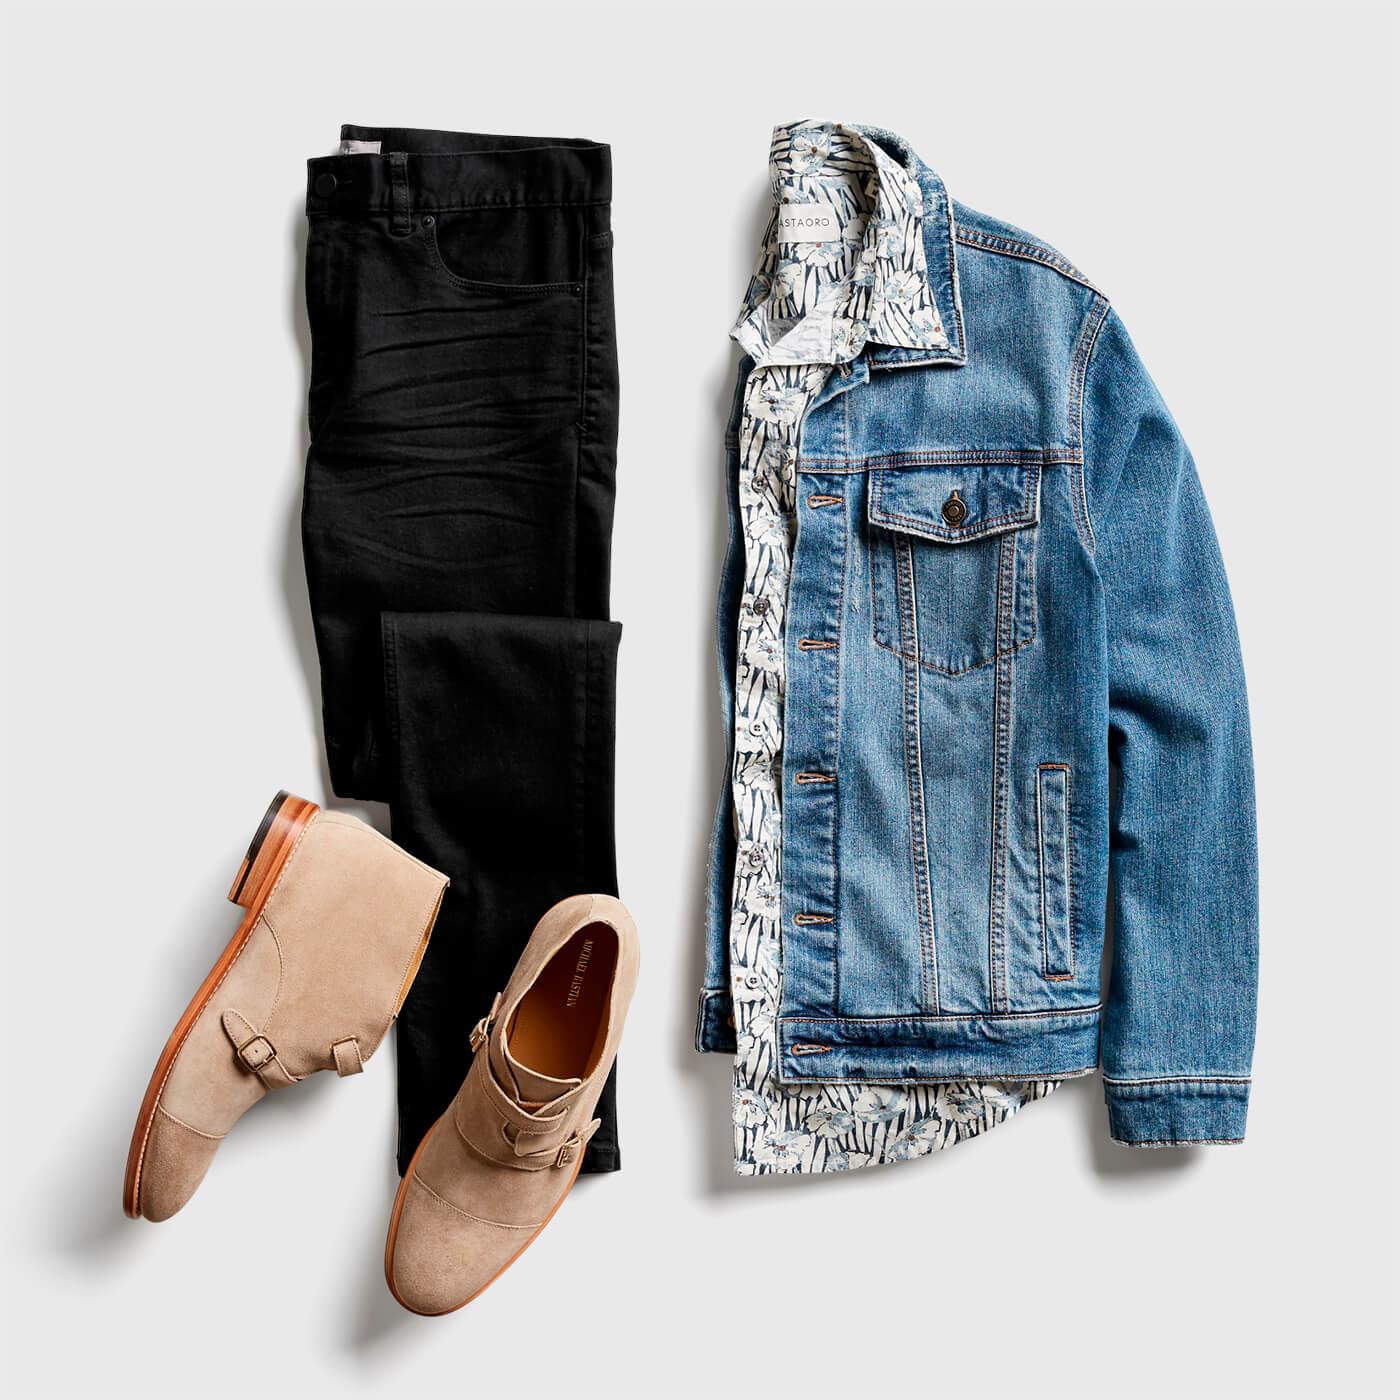 814e423a7 What do I wear with a jean jacket?   Stitch Fix Men